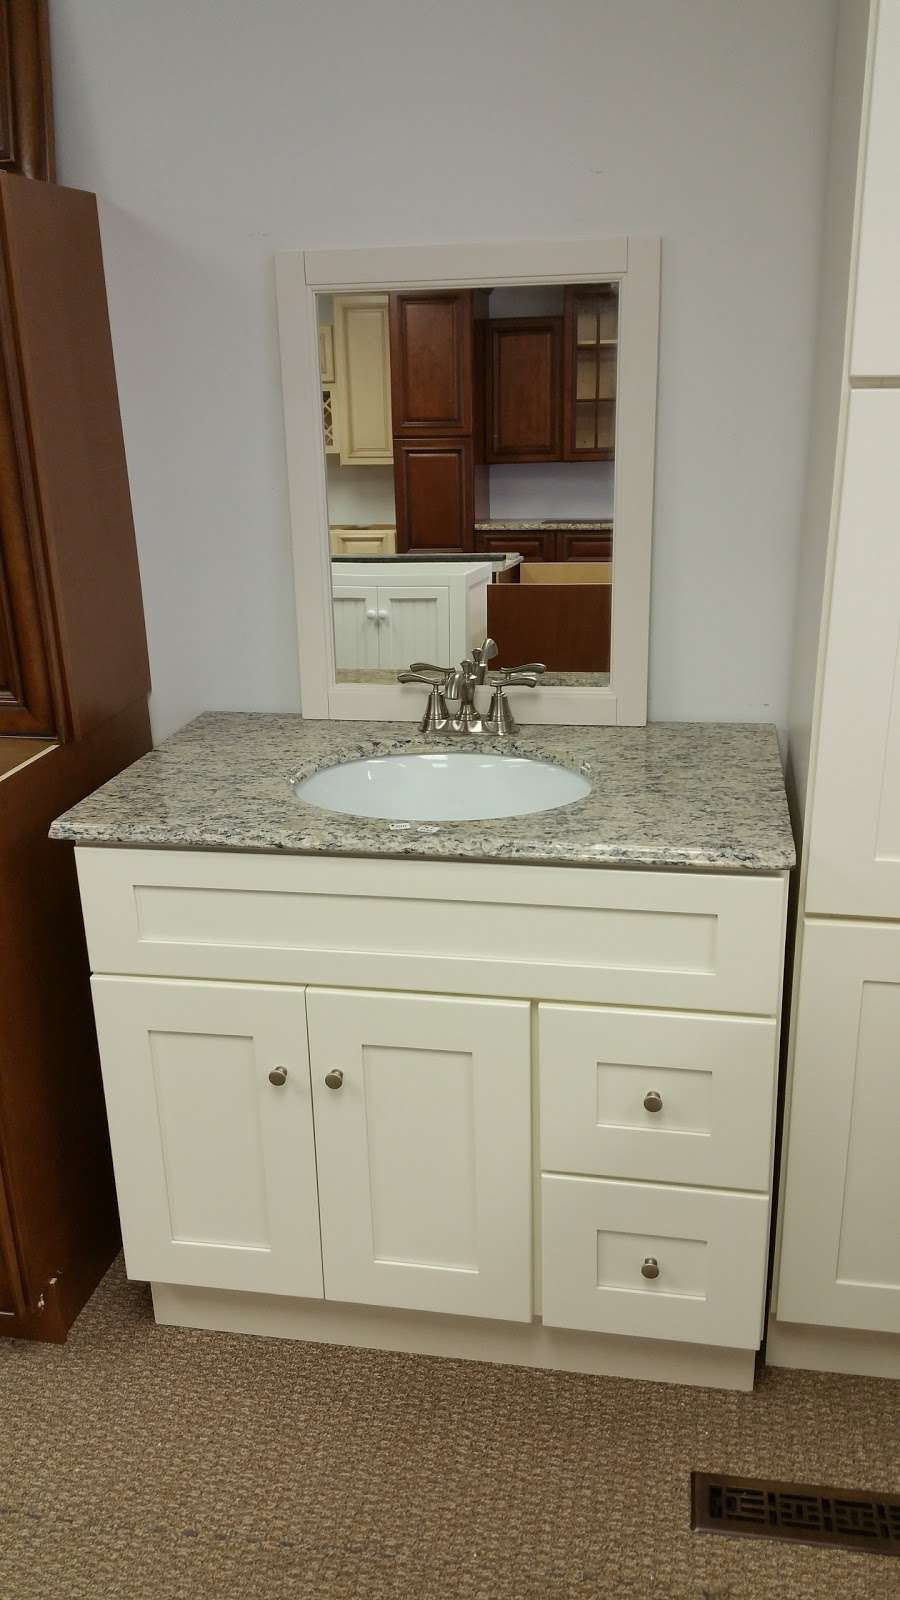 Blue Rock-Cabinets - furniture store  | Photo 9 of 10 | Address: 677 Estelle Dr, Lancaster, PA 17601, USA | Phone: (717) 368-7111